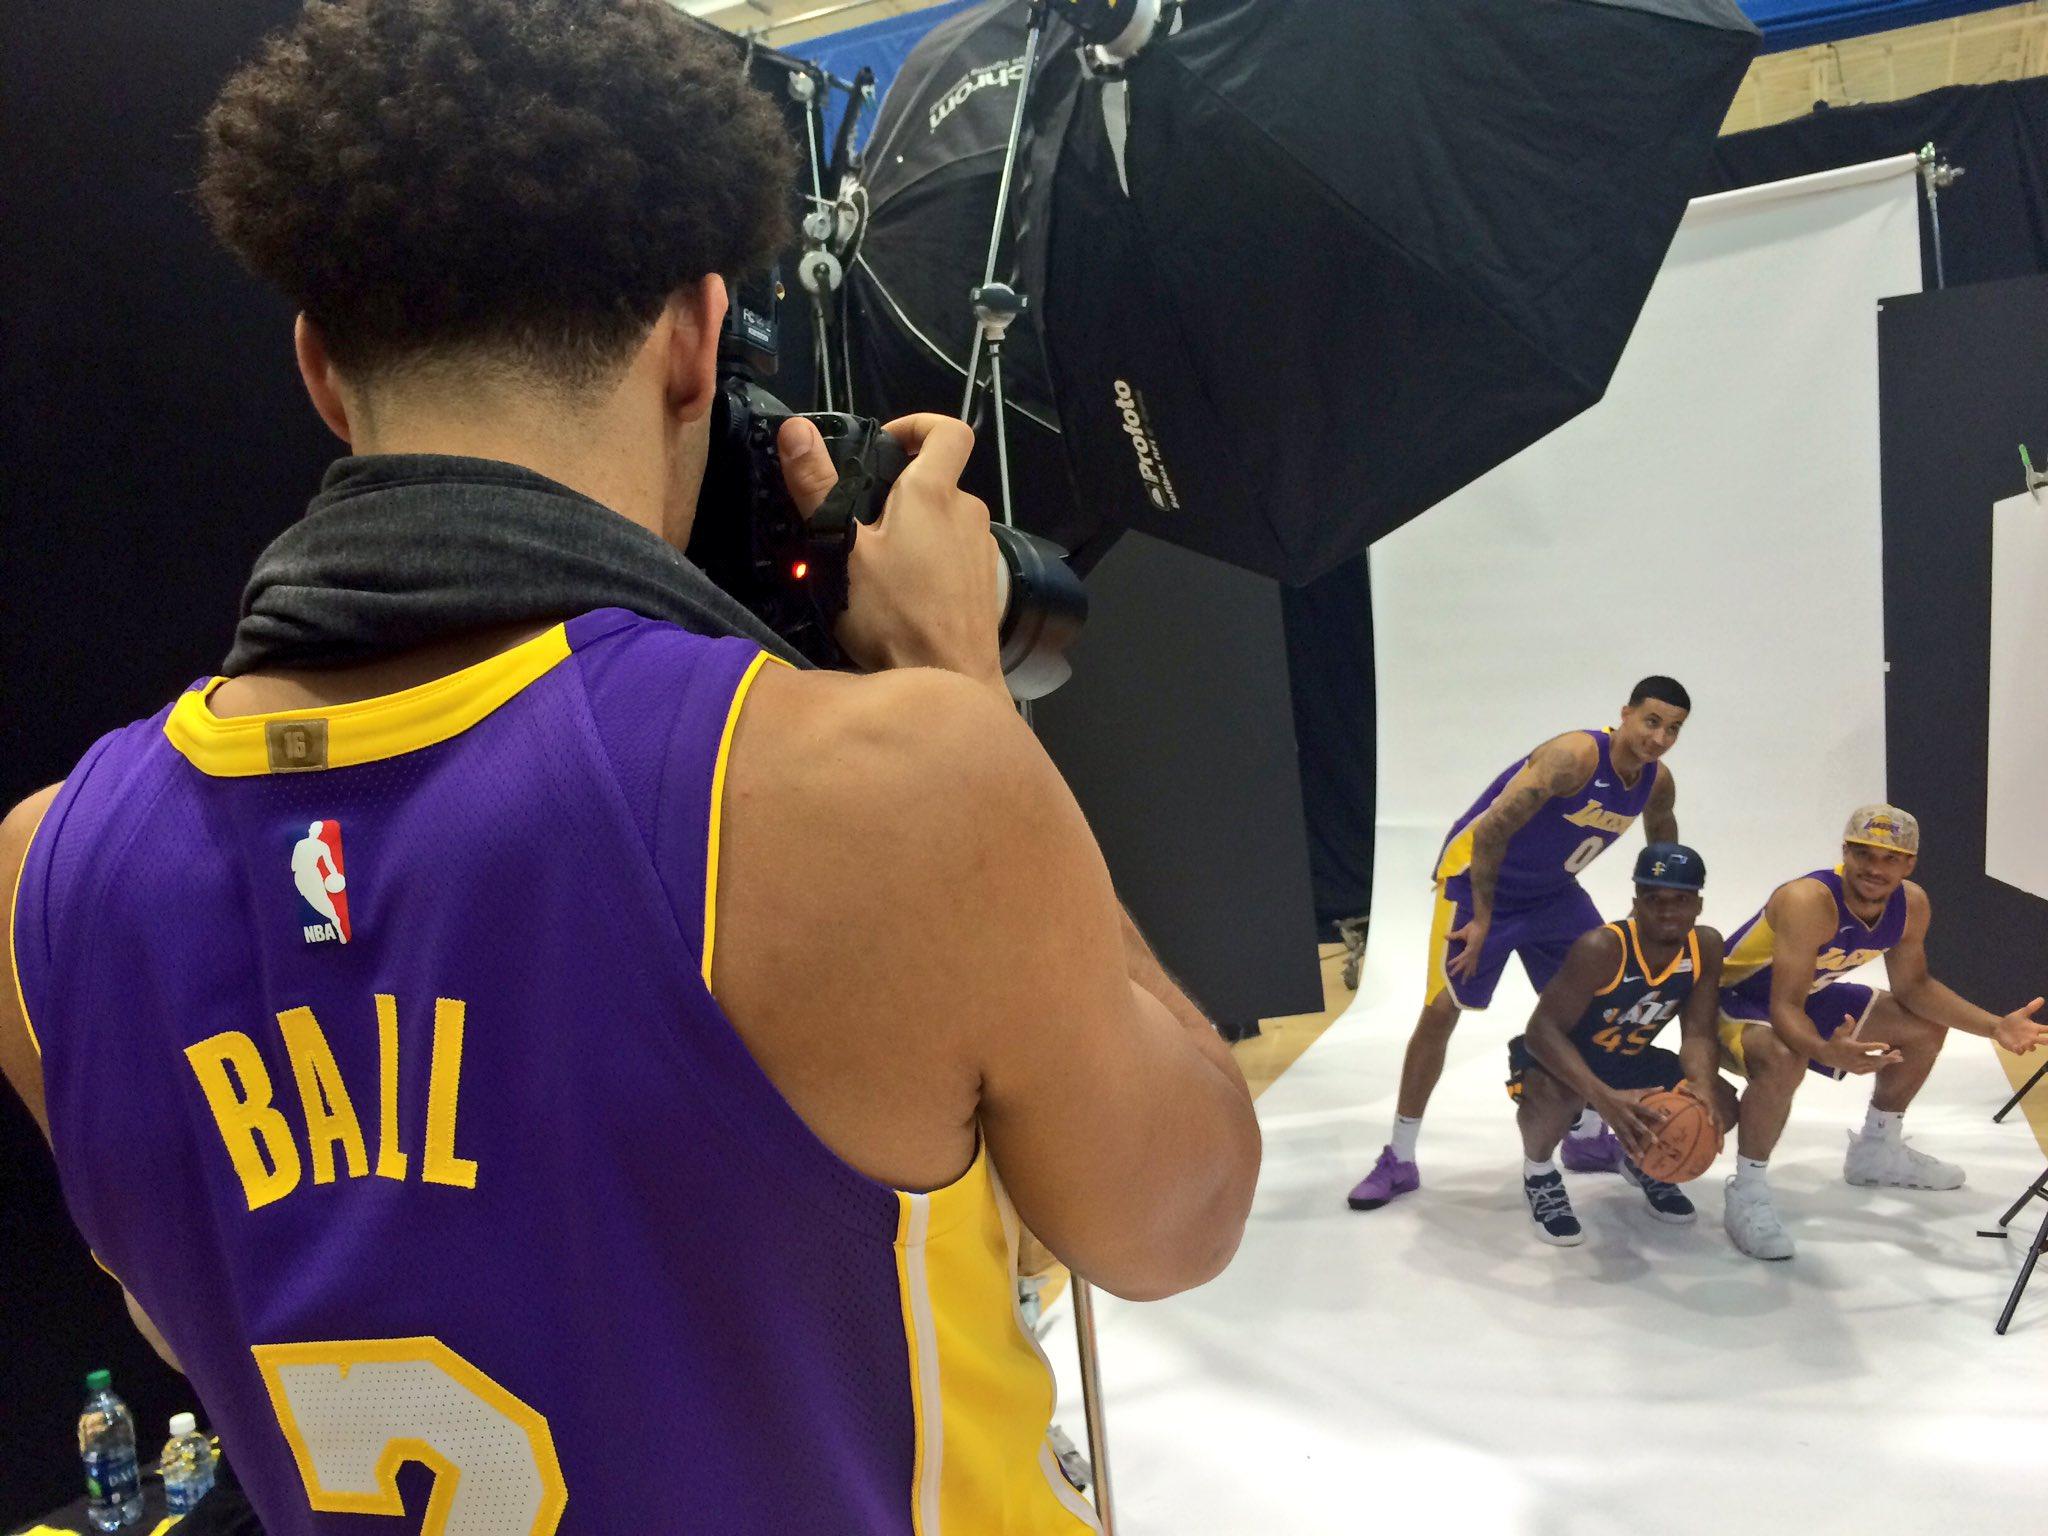 .@Lakers rook @ZO2_: @PaniniAmerica photographer. #WhoDoYouCollect #PaniniNBARookie https://t.co/ren84MWlHL